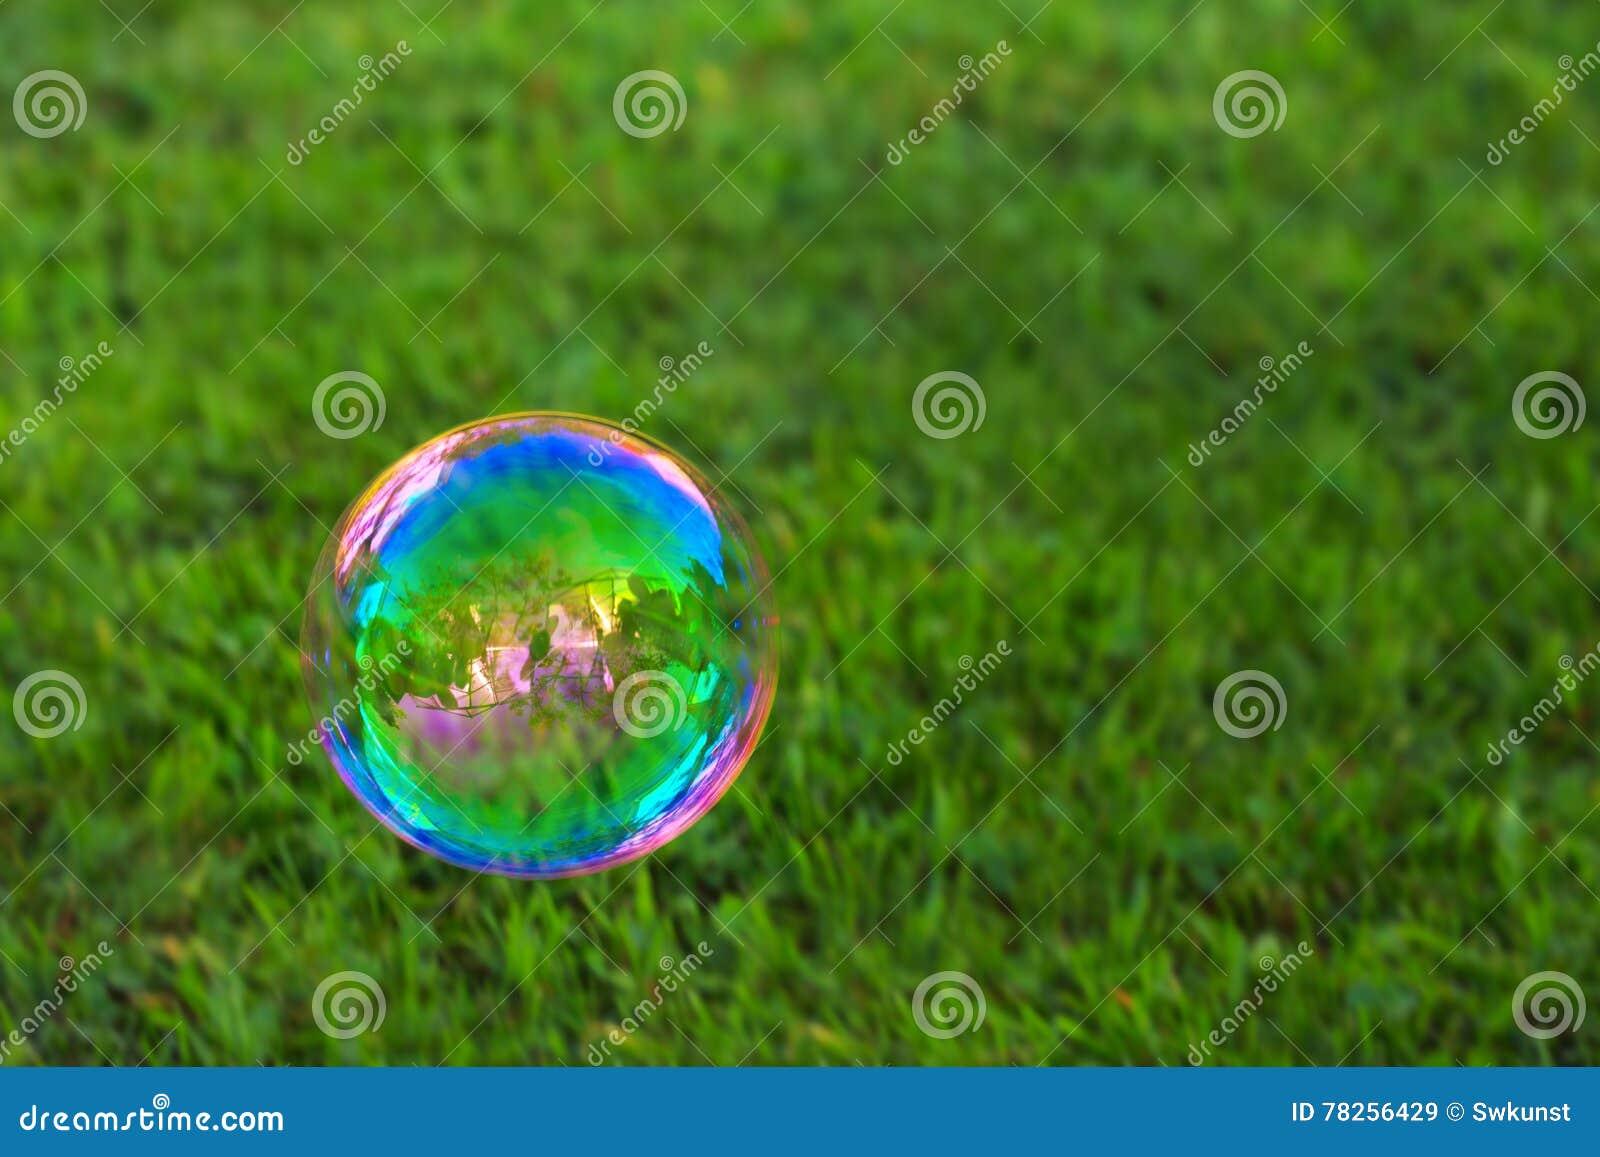 Soapbubble στο πράσινο φυσικό υπόβαθρο